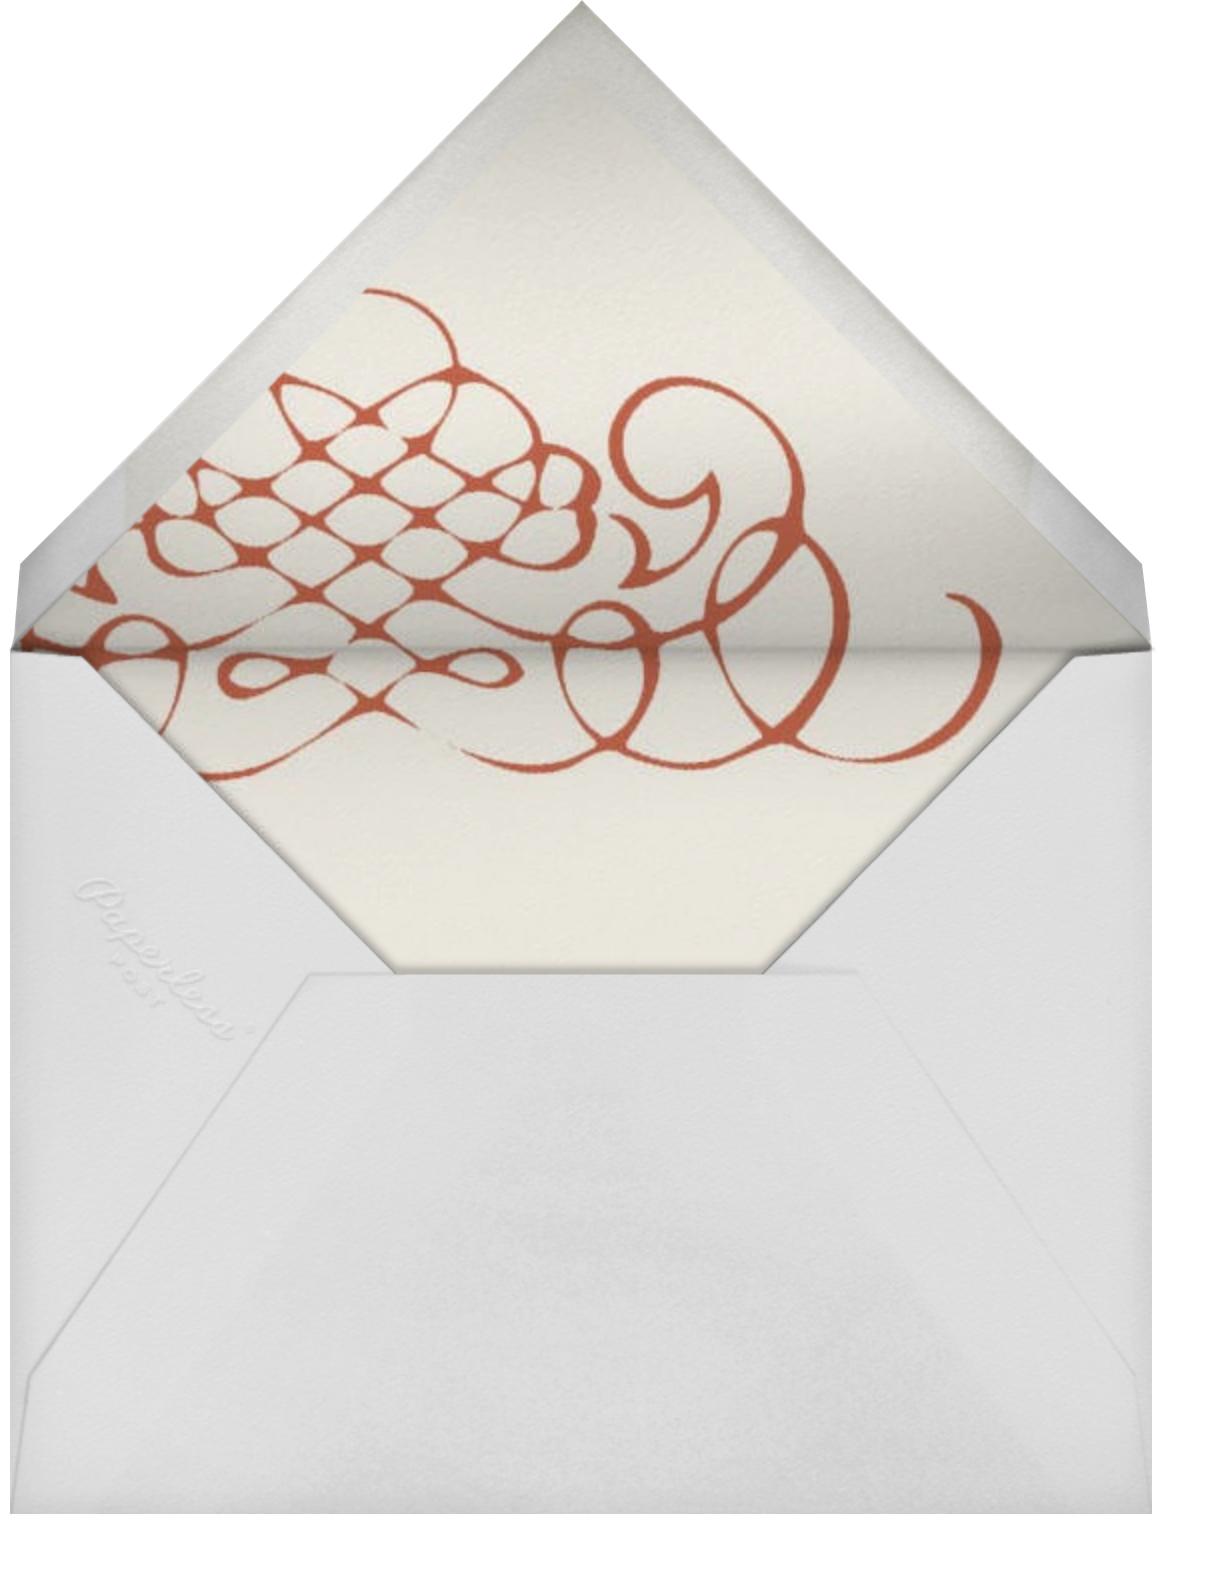 Antique Press- Cream with Blood Orange (Horizontal) - Paperless Post - Envelope